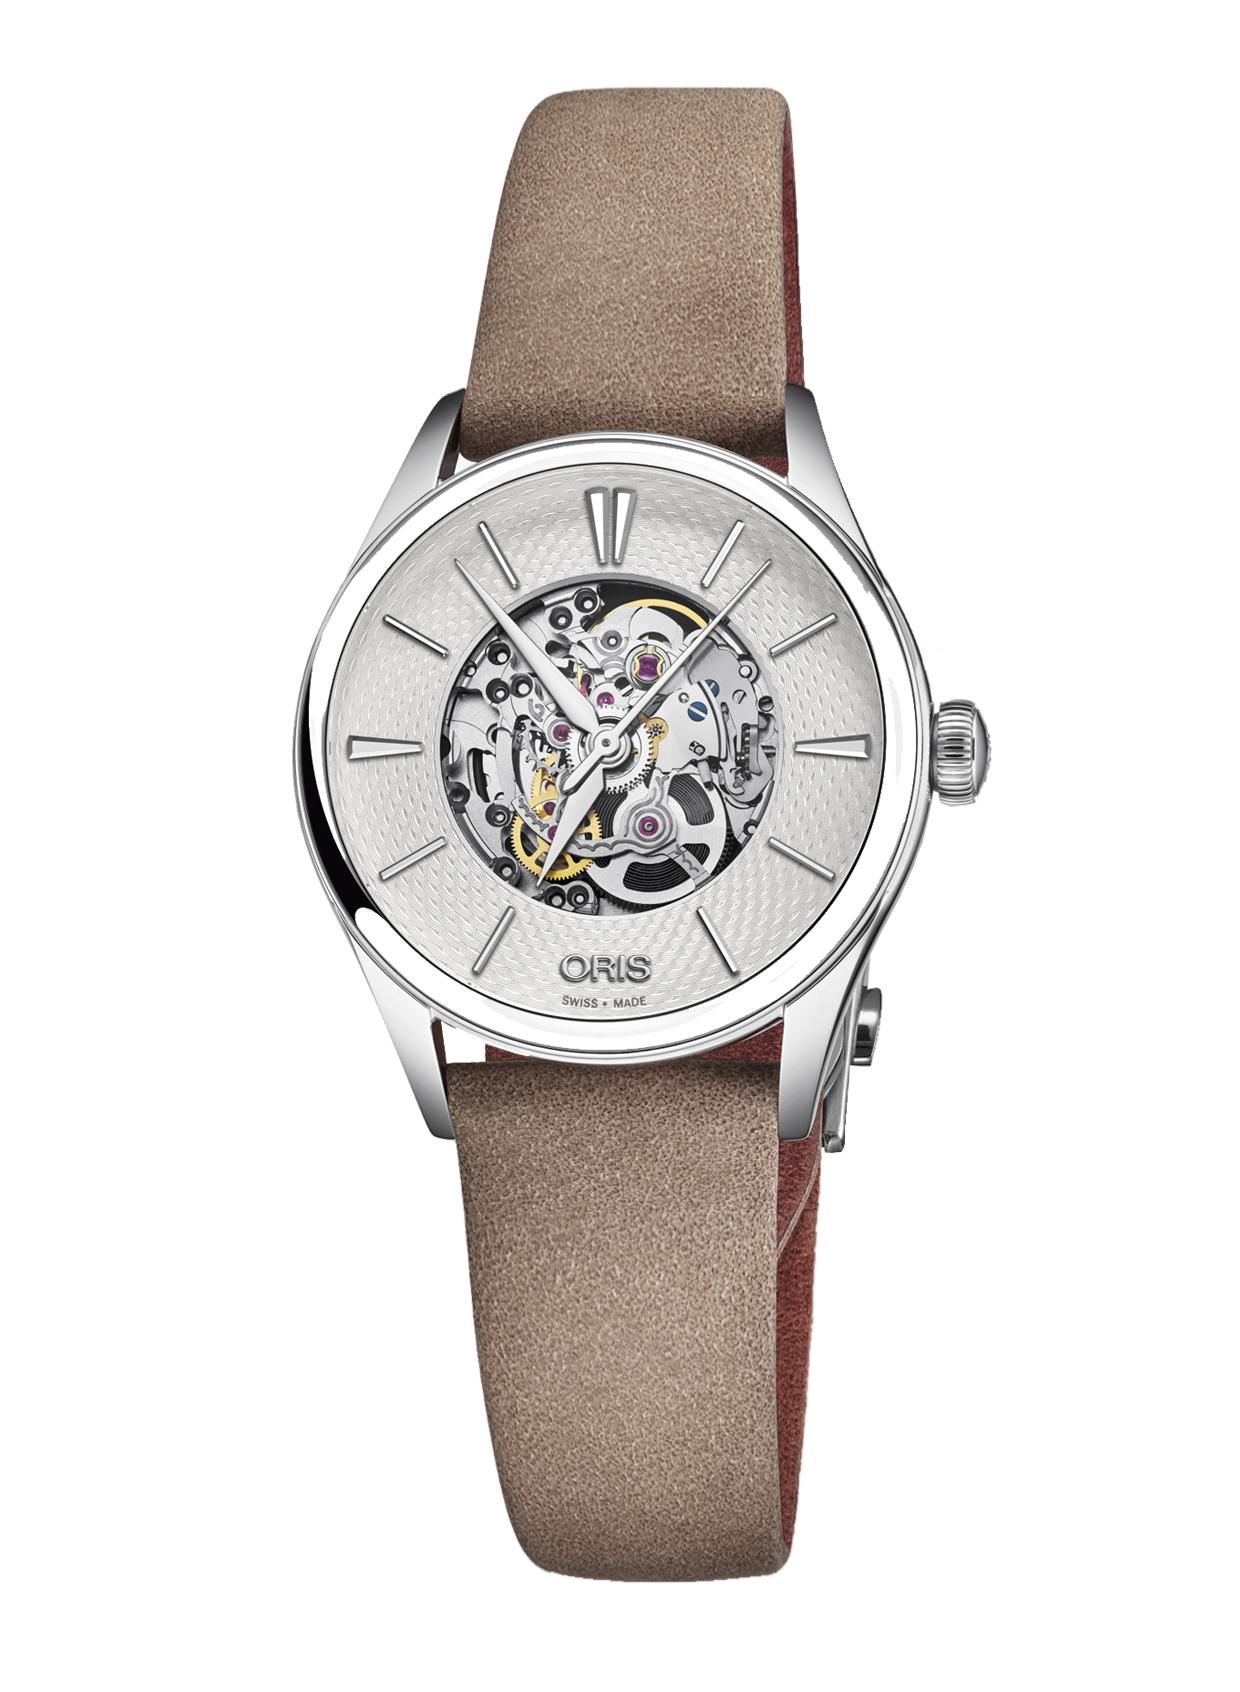 Часы Oris Culture Artelier Skeleton 560.7724.4051 LS 5.17.33FC